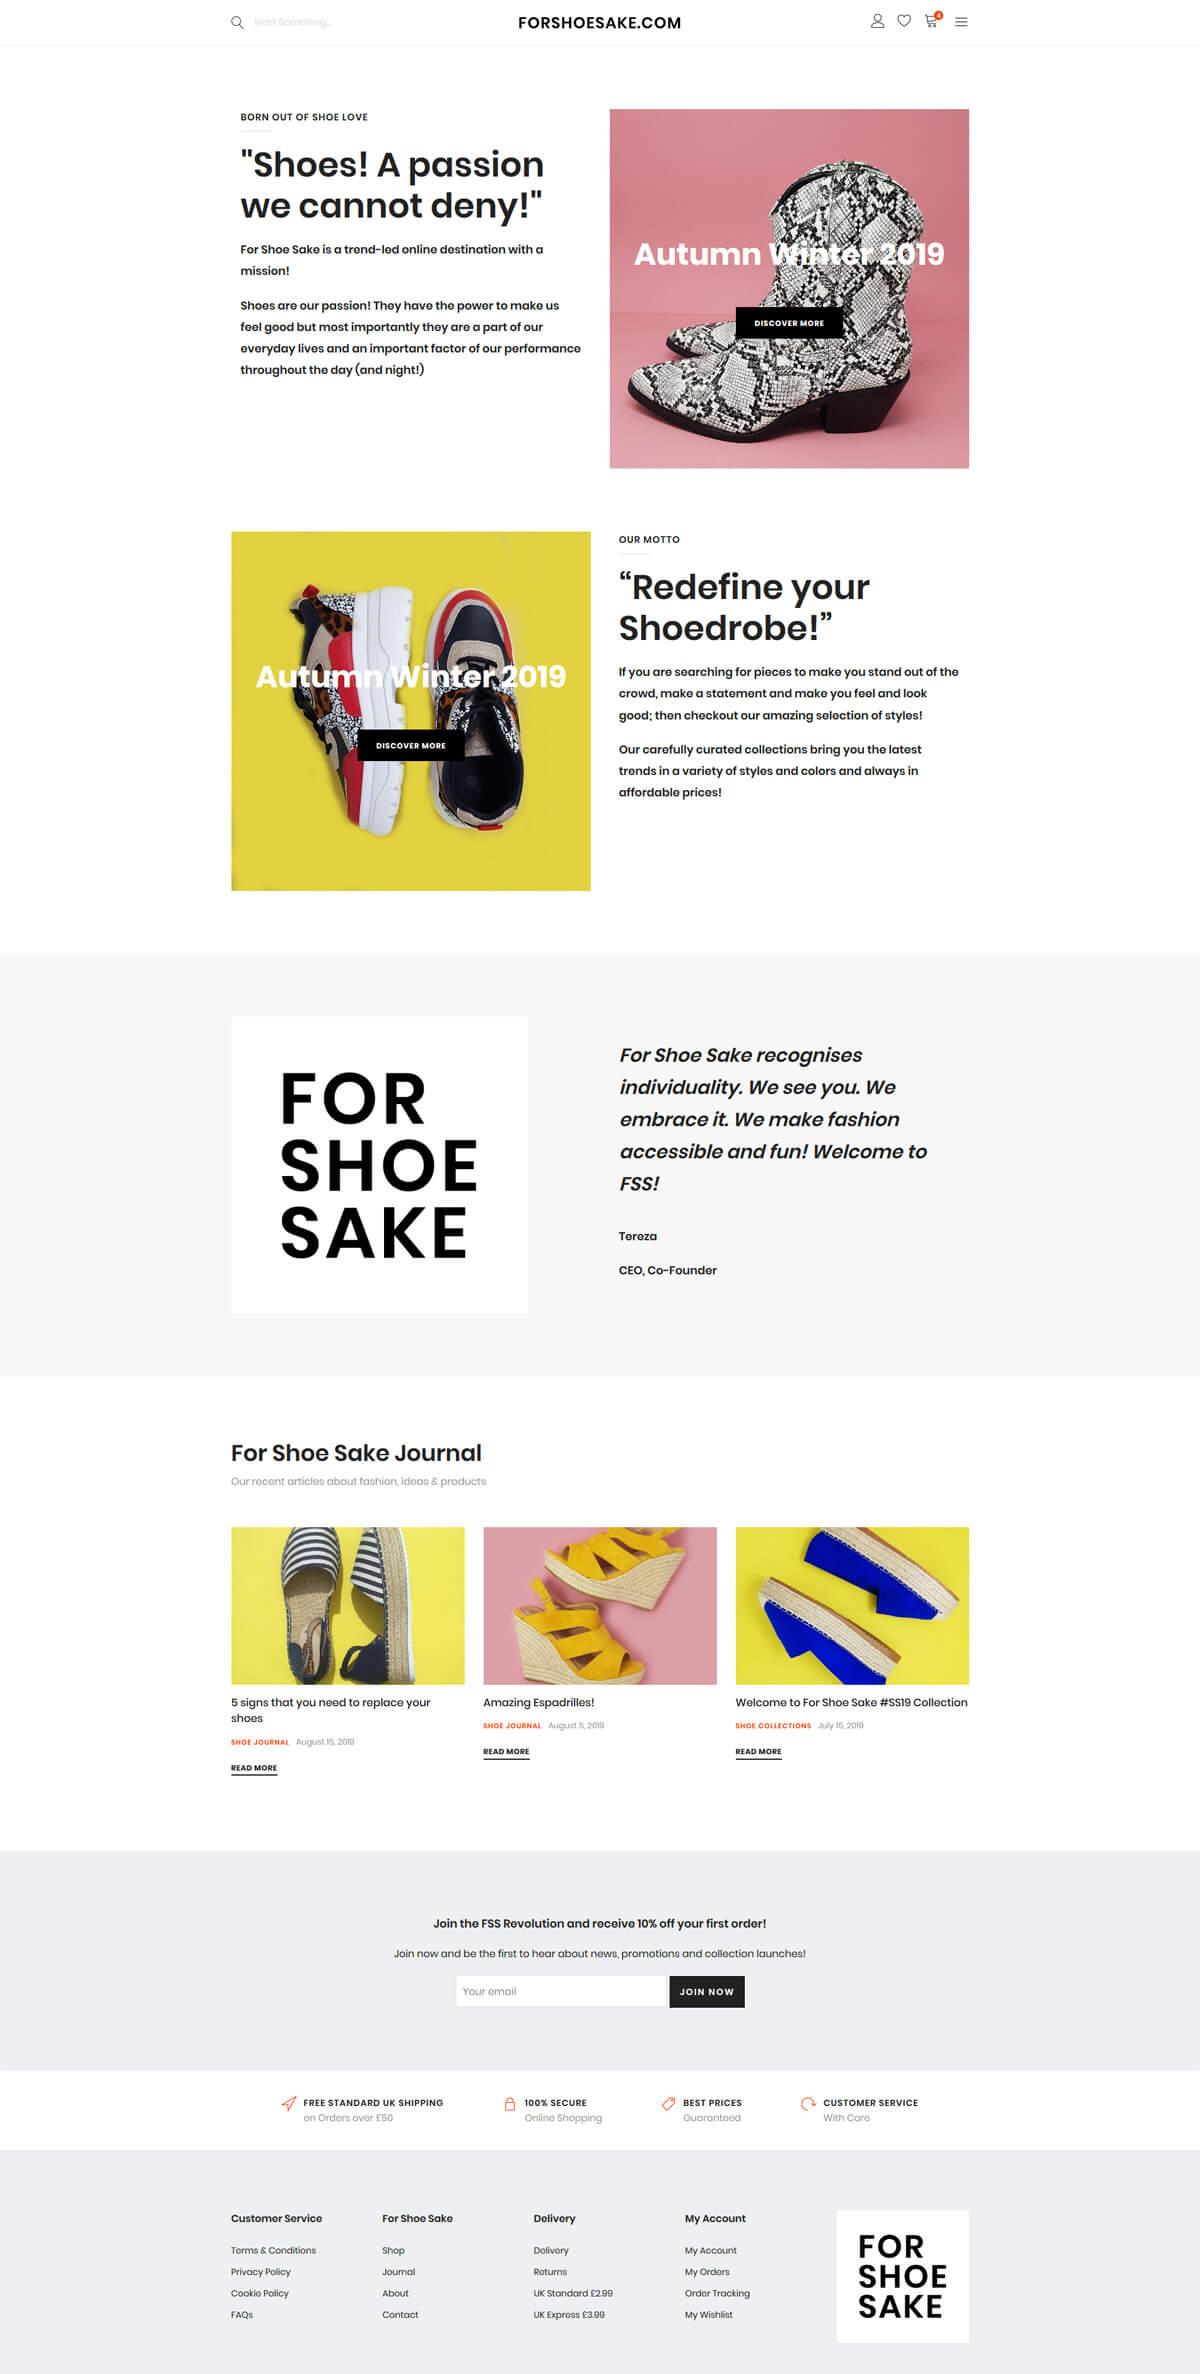 For Shoe Sake - forshoesake.com - Case Study 2 - developed by Digital Artifacts Creative